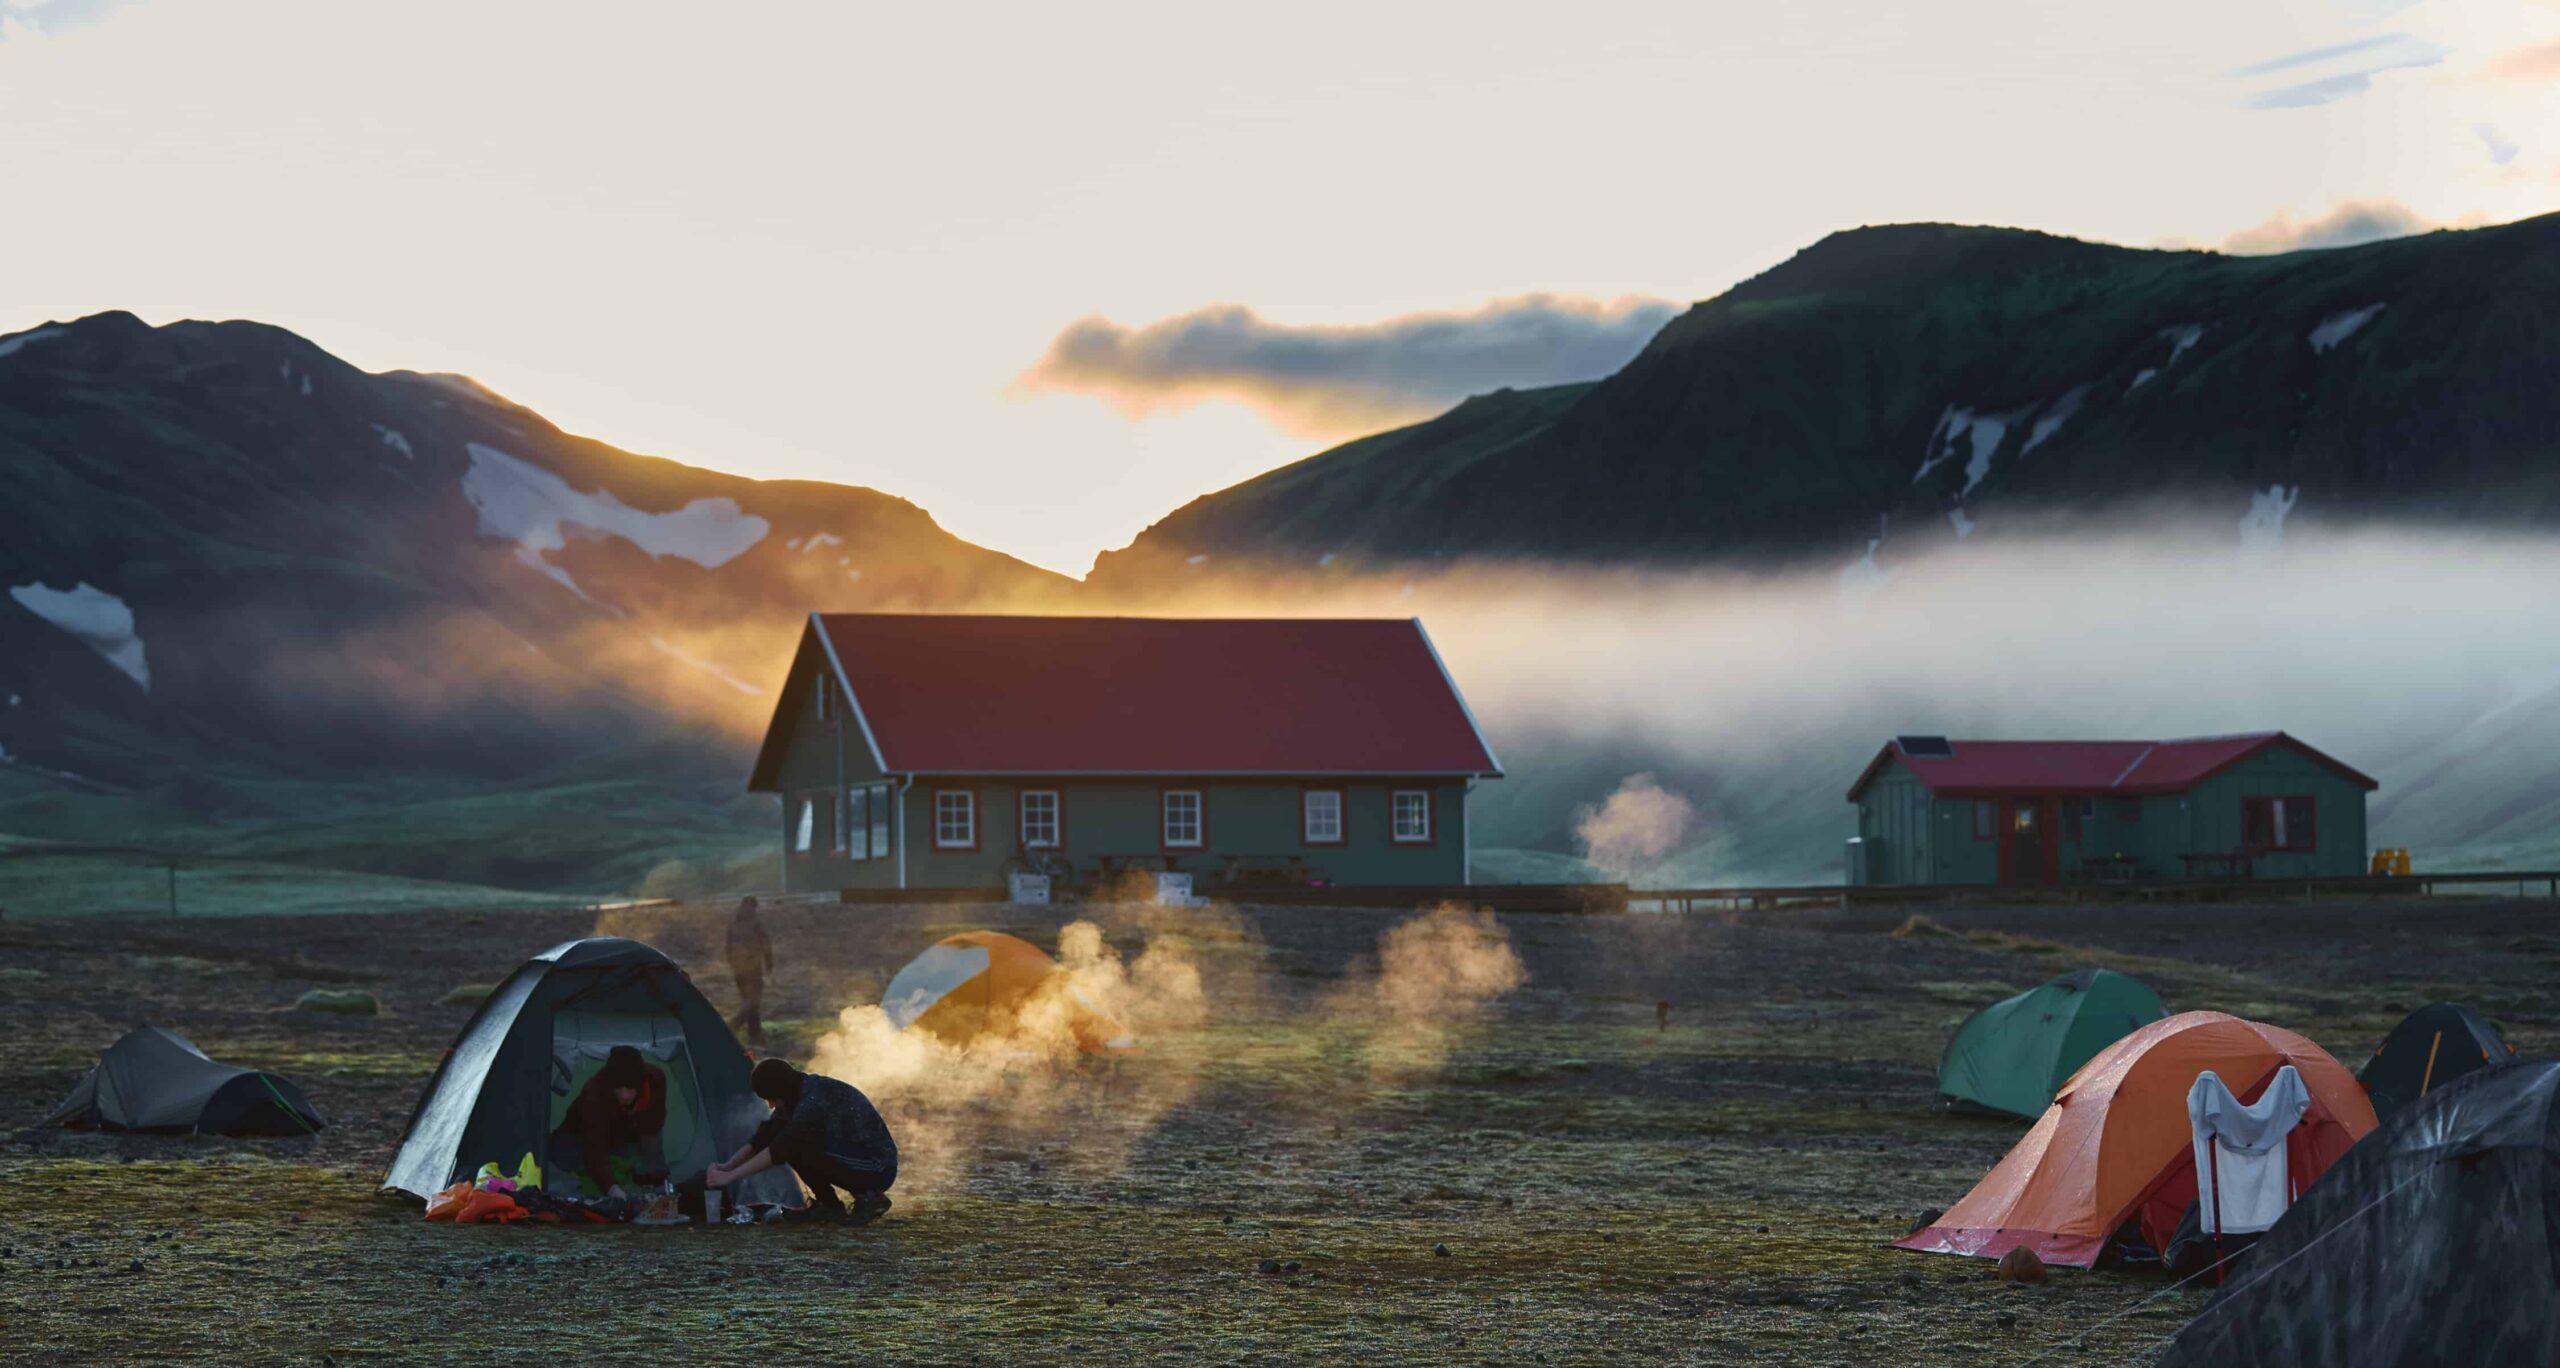 Laugavegur campsite in the highlands of Iceland